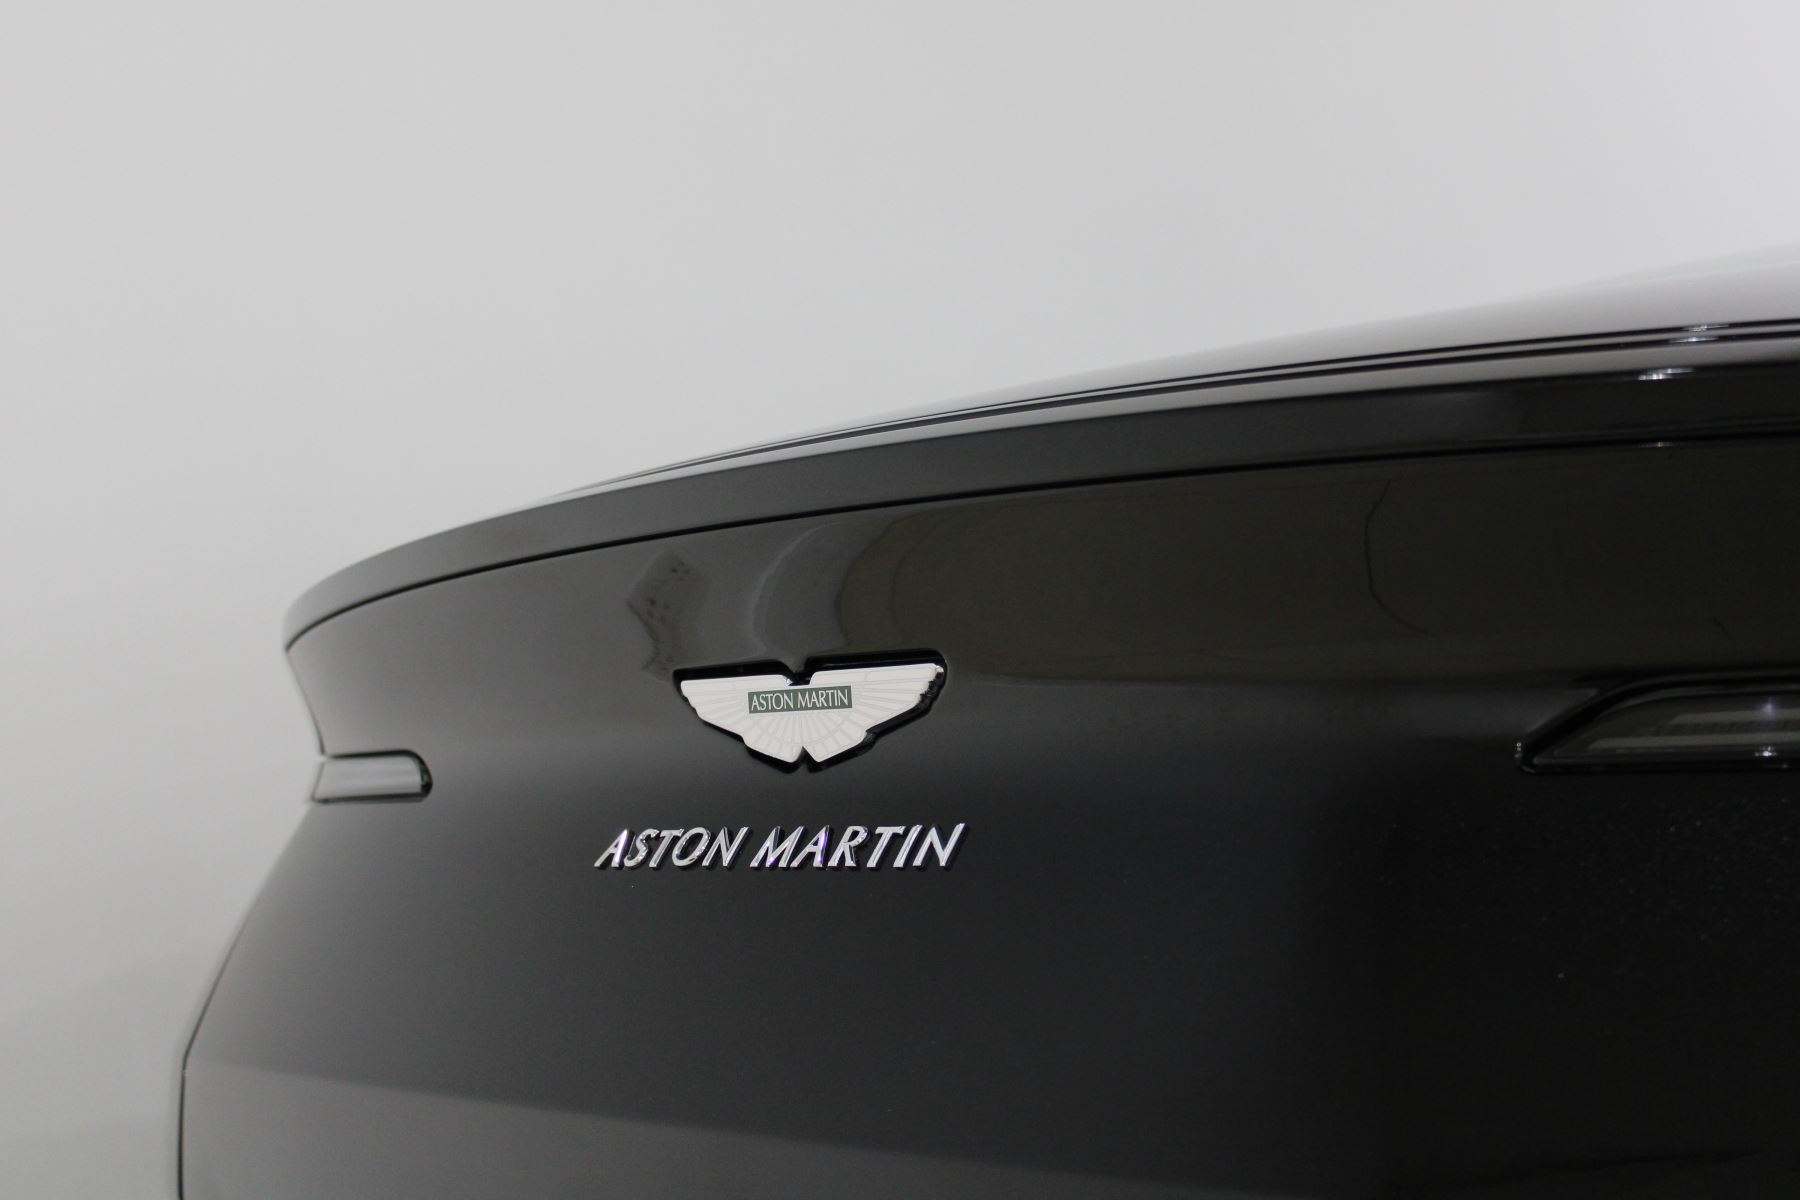 Aston Martin DB11 V12 AMR Touchtronic image 23